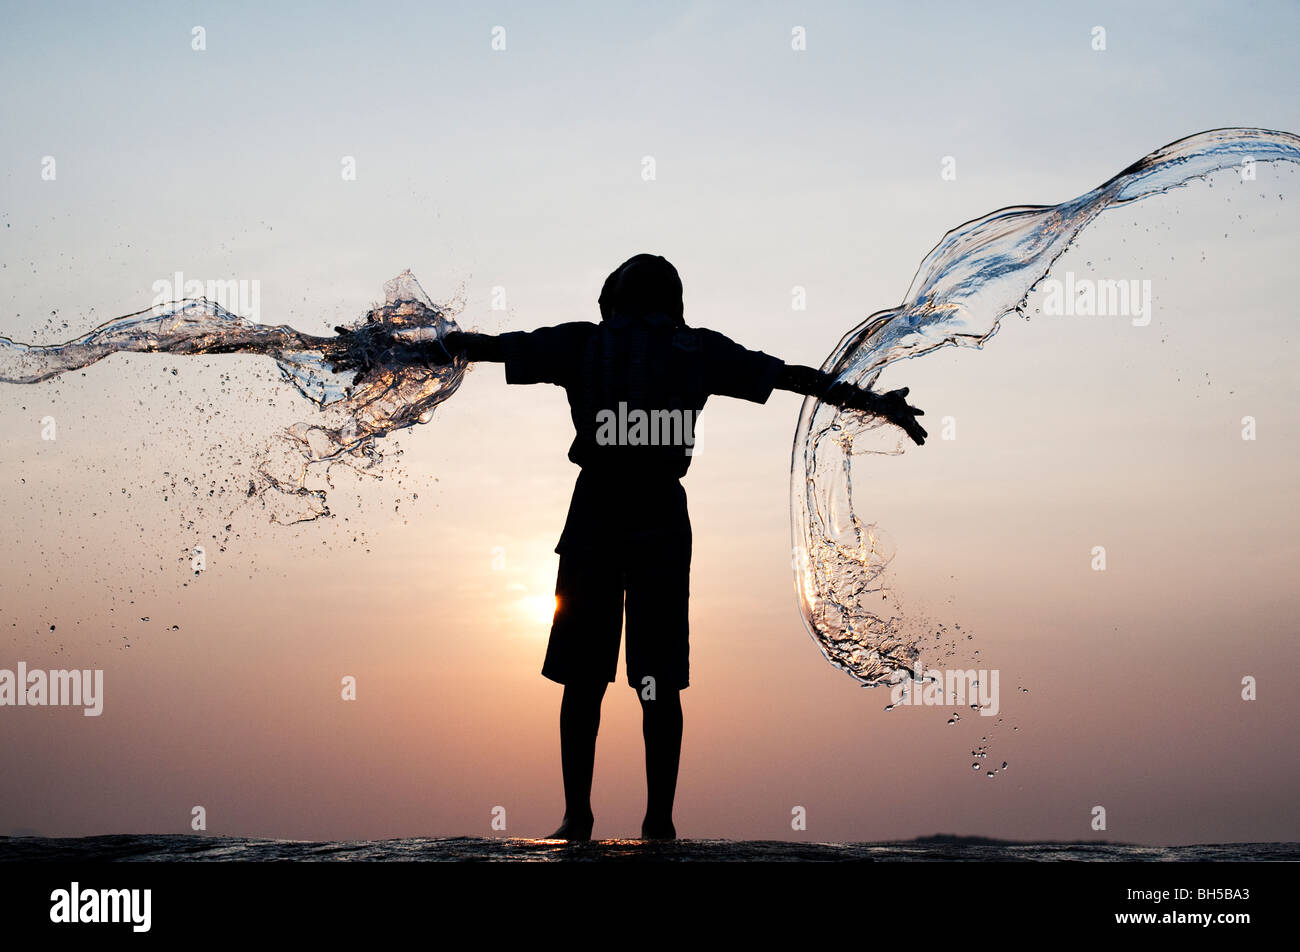 Indian boy having water thrown at him against an indian sunset. Silhouette. Andhra Pradesh, India - Stock Image